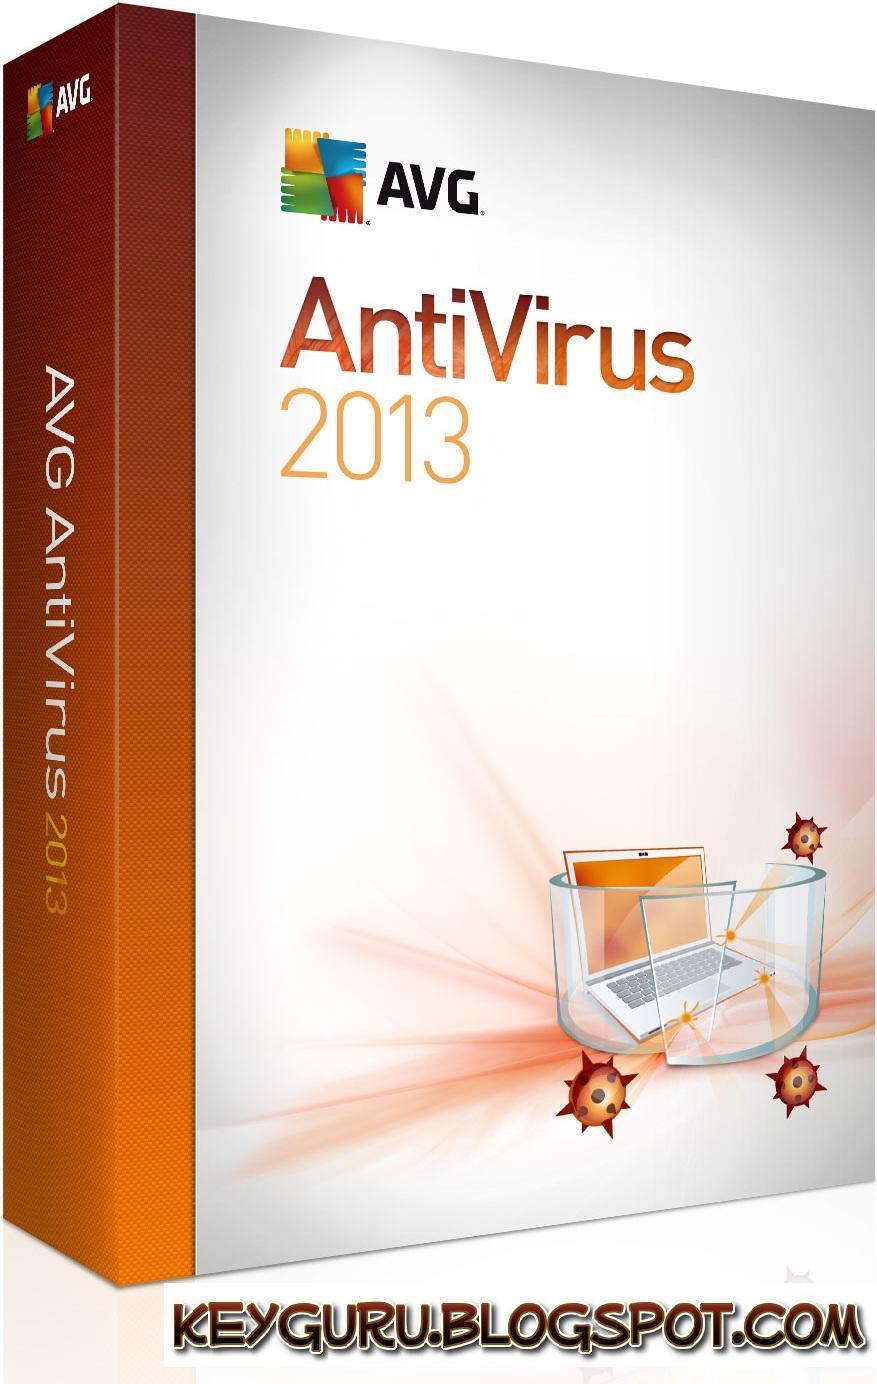 avg antivirus free download 2012 full version